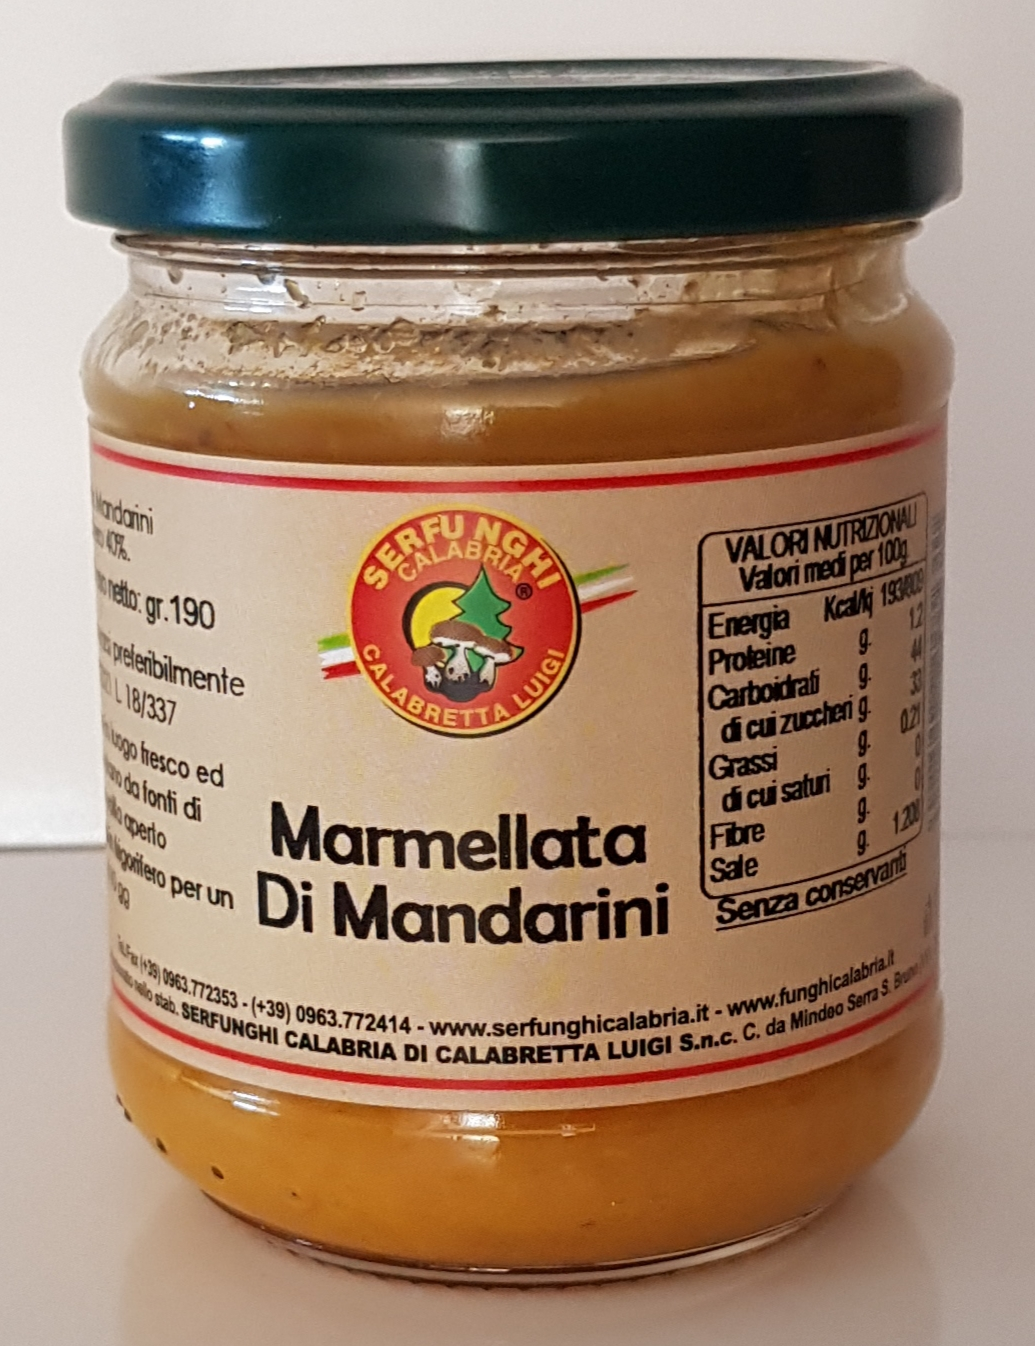 MARMELLATA DI MANDARINO ML 212